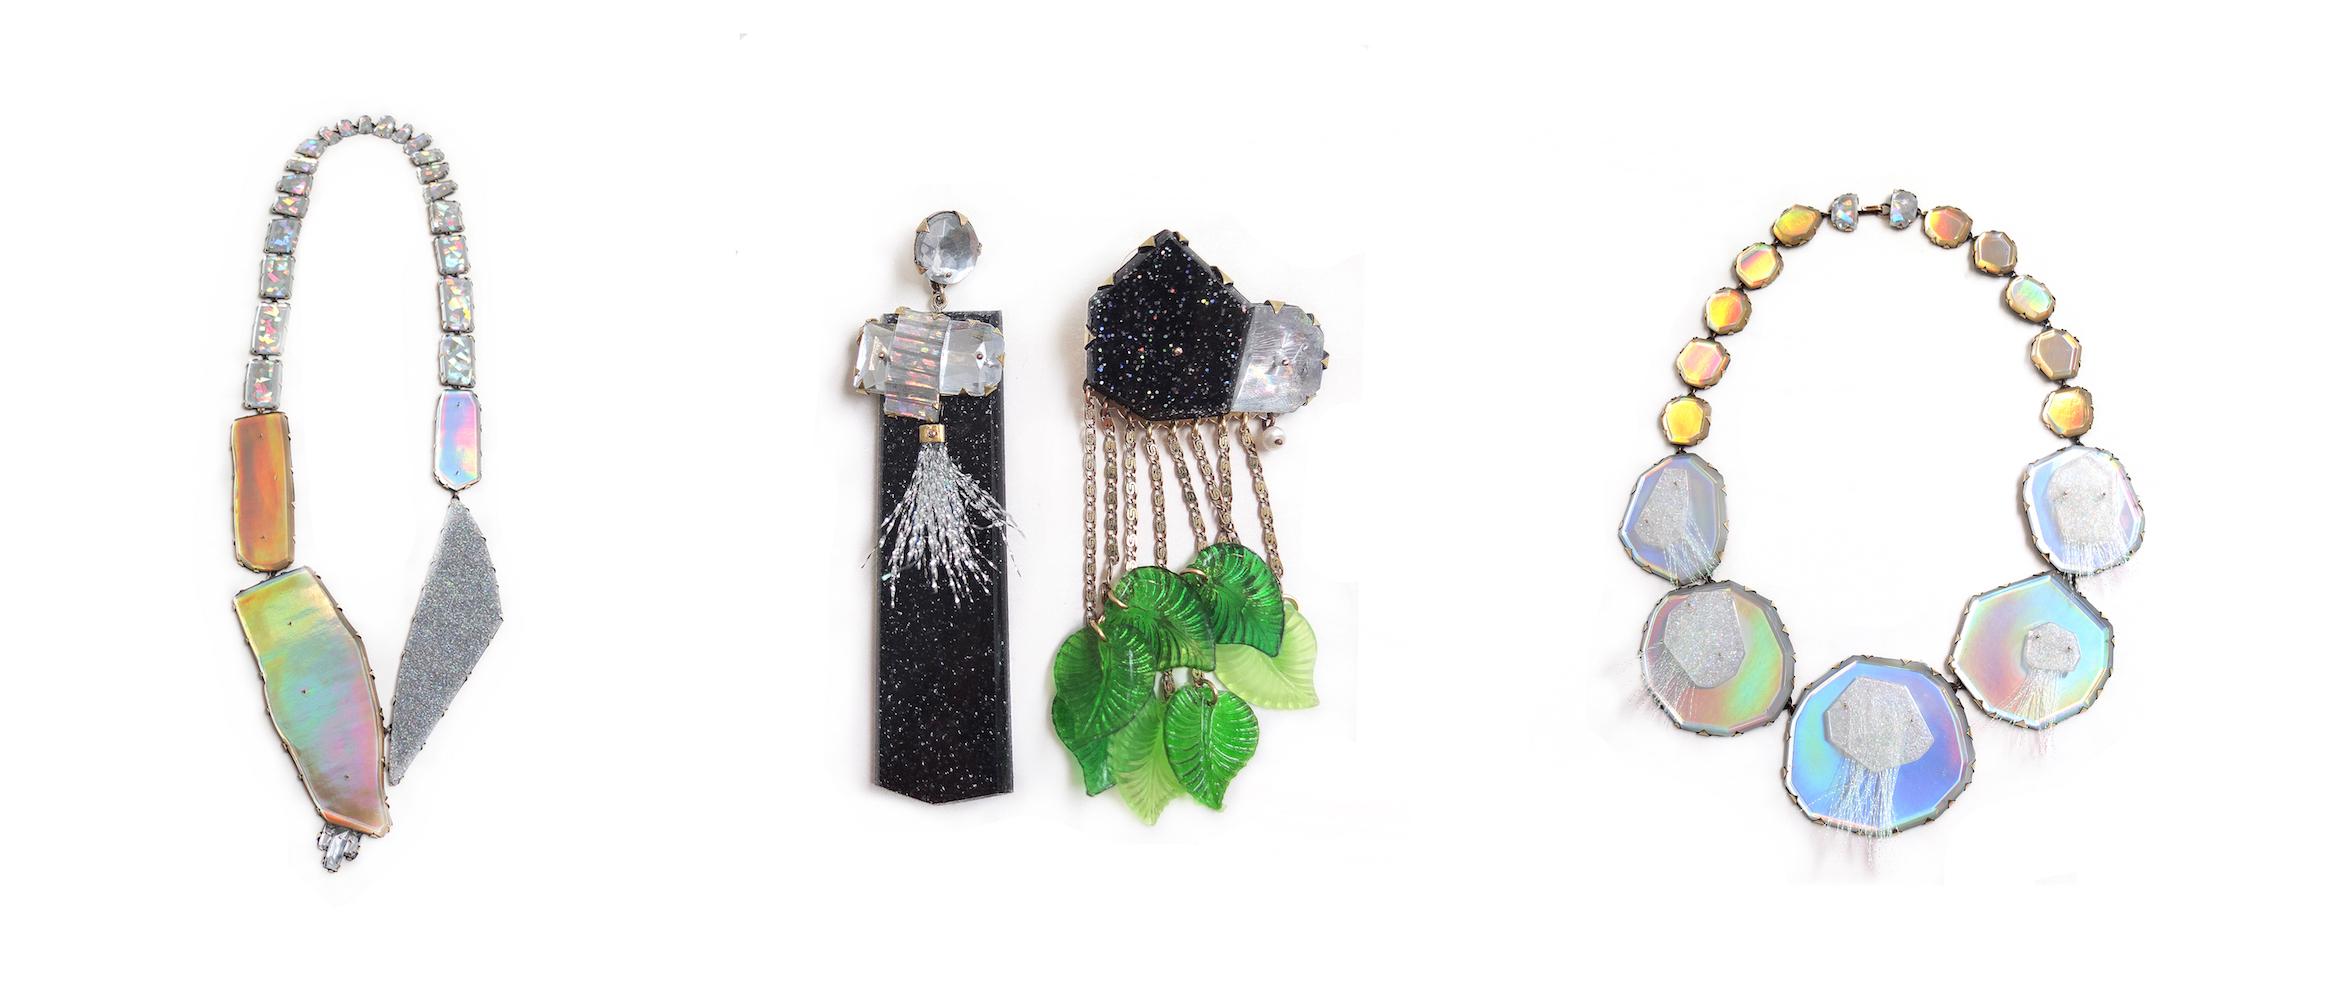 Work by jewelry artist Nikki Couppee